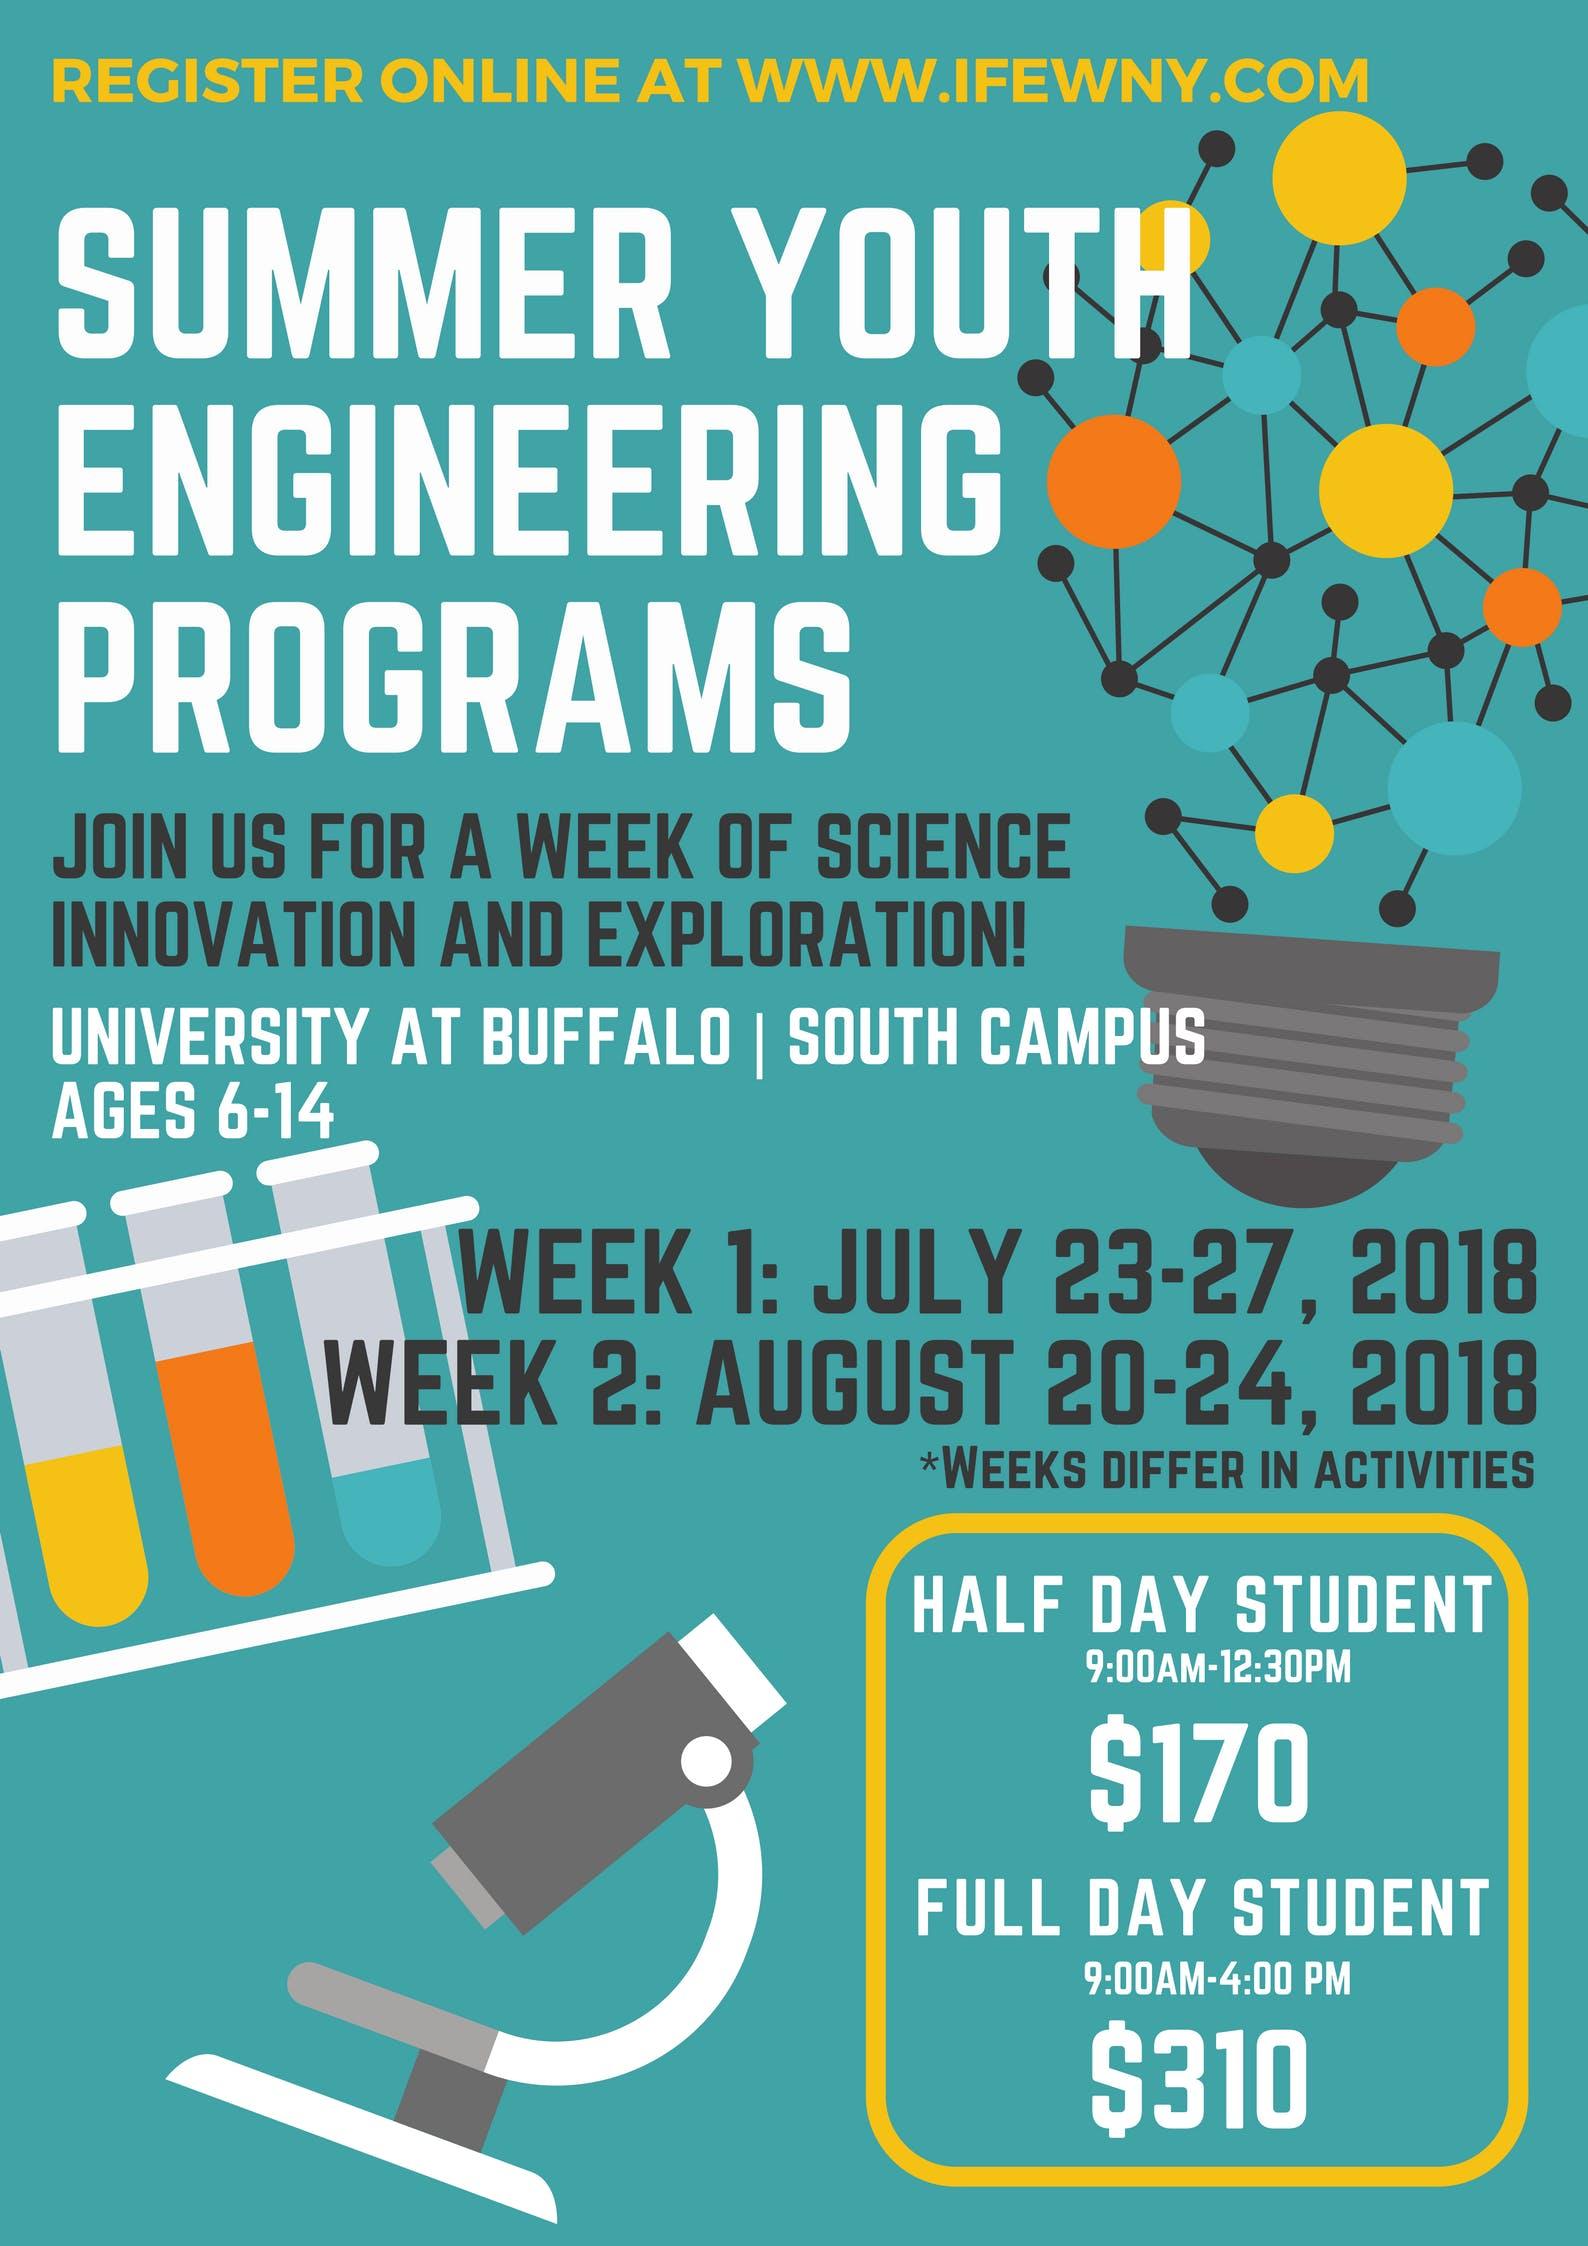 Youth Engineering Summer Program Buffalo Ny Aug 20